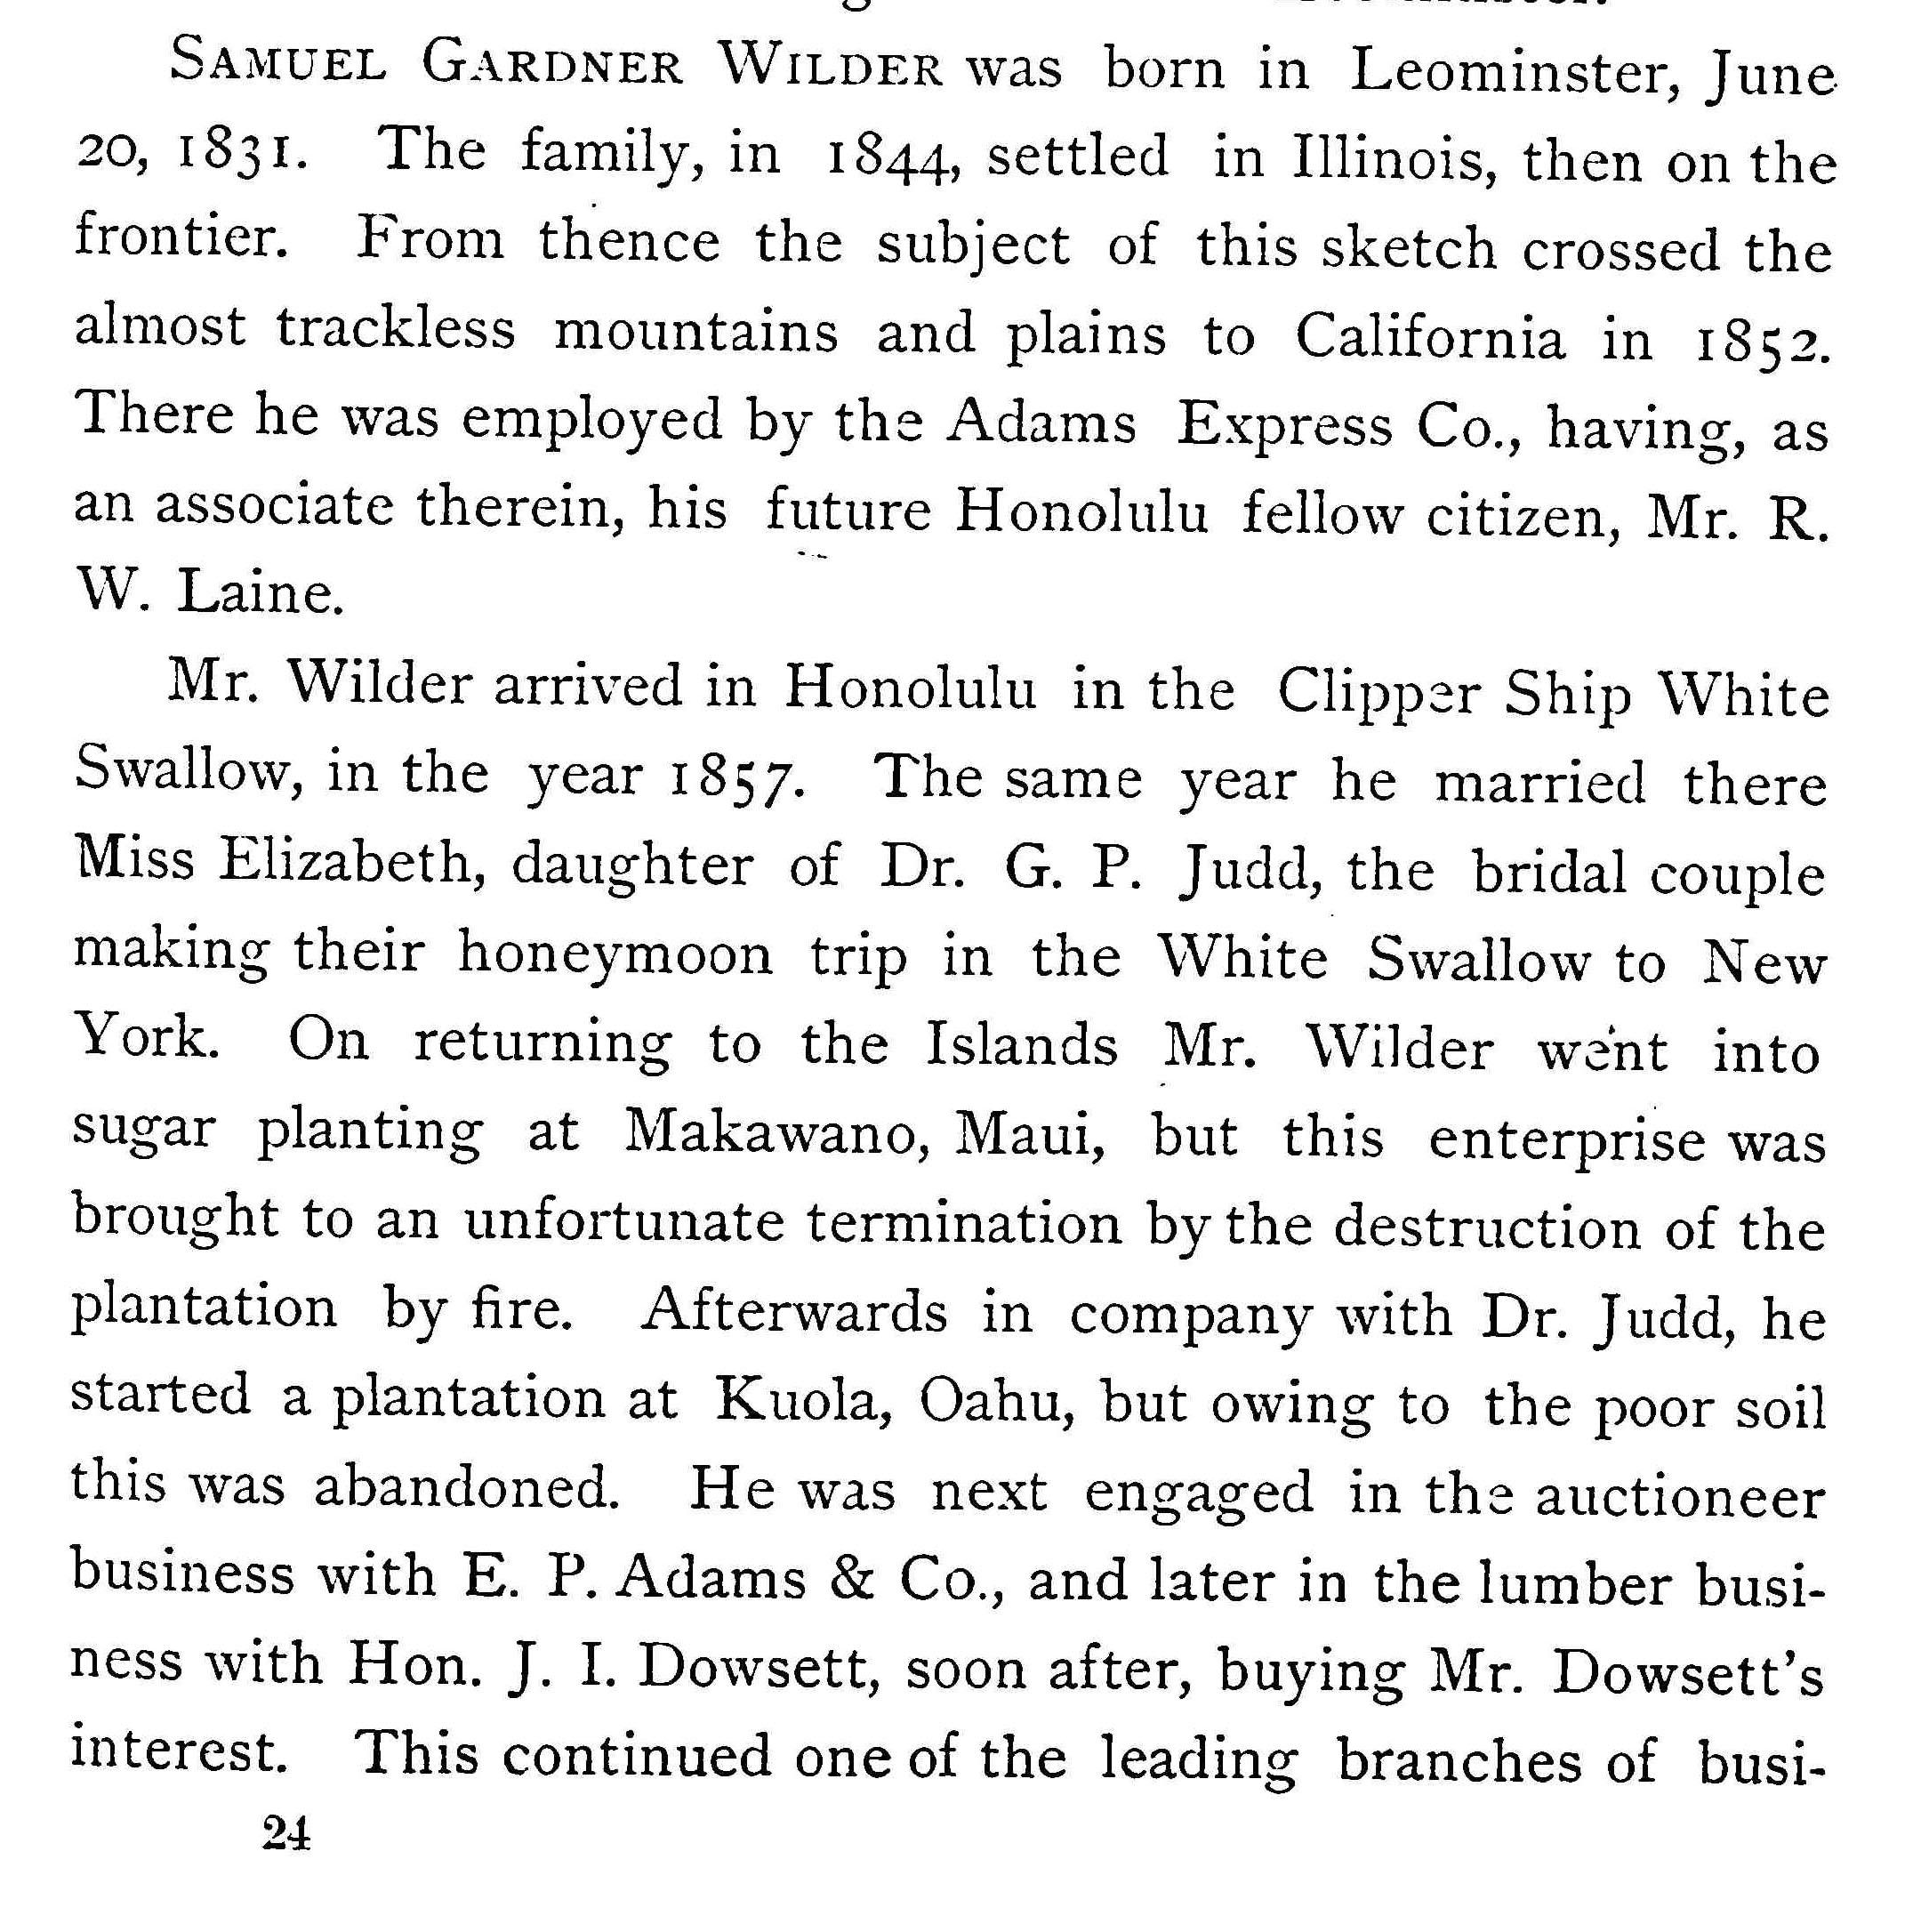 Samuel G. Wilder Biography